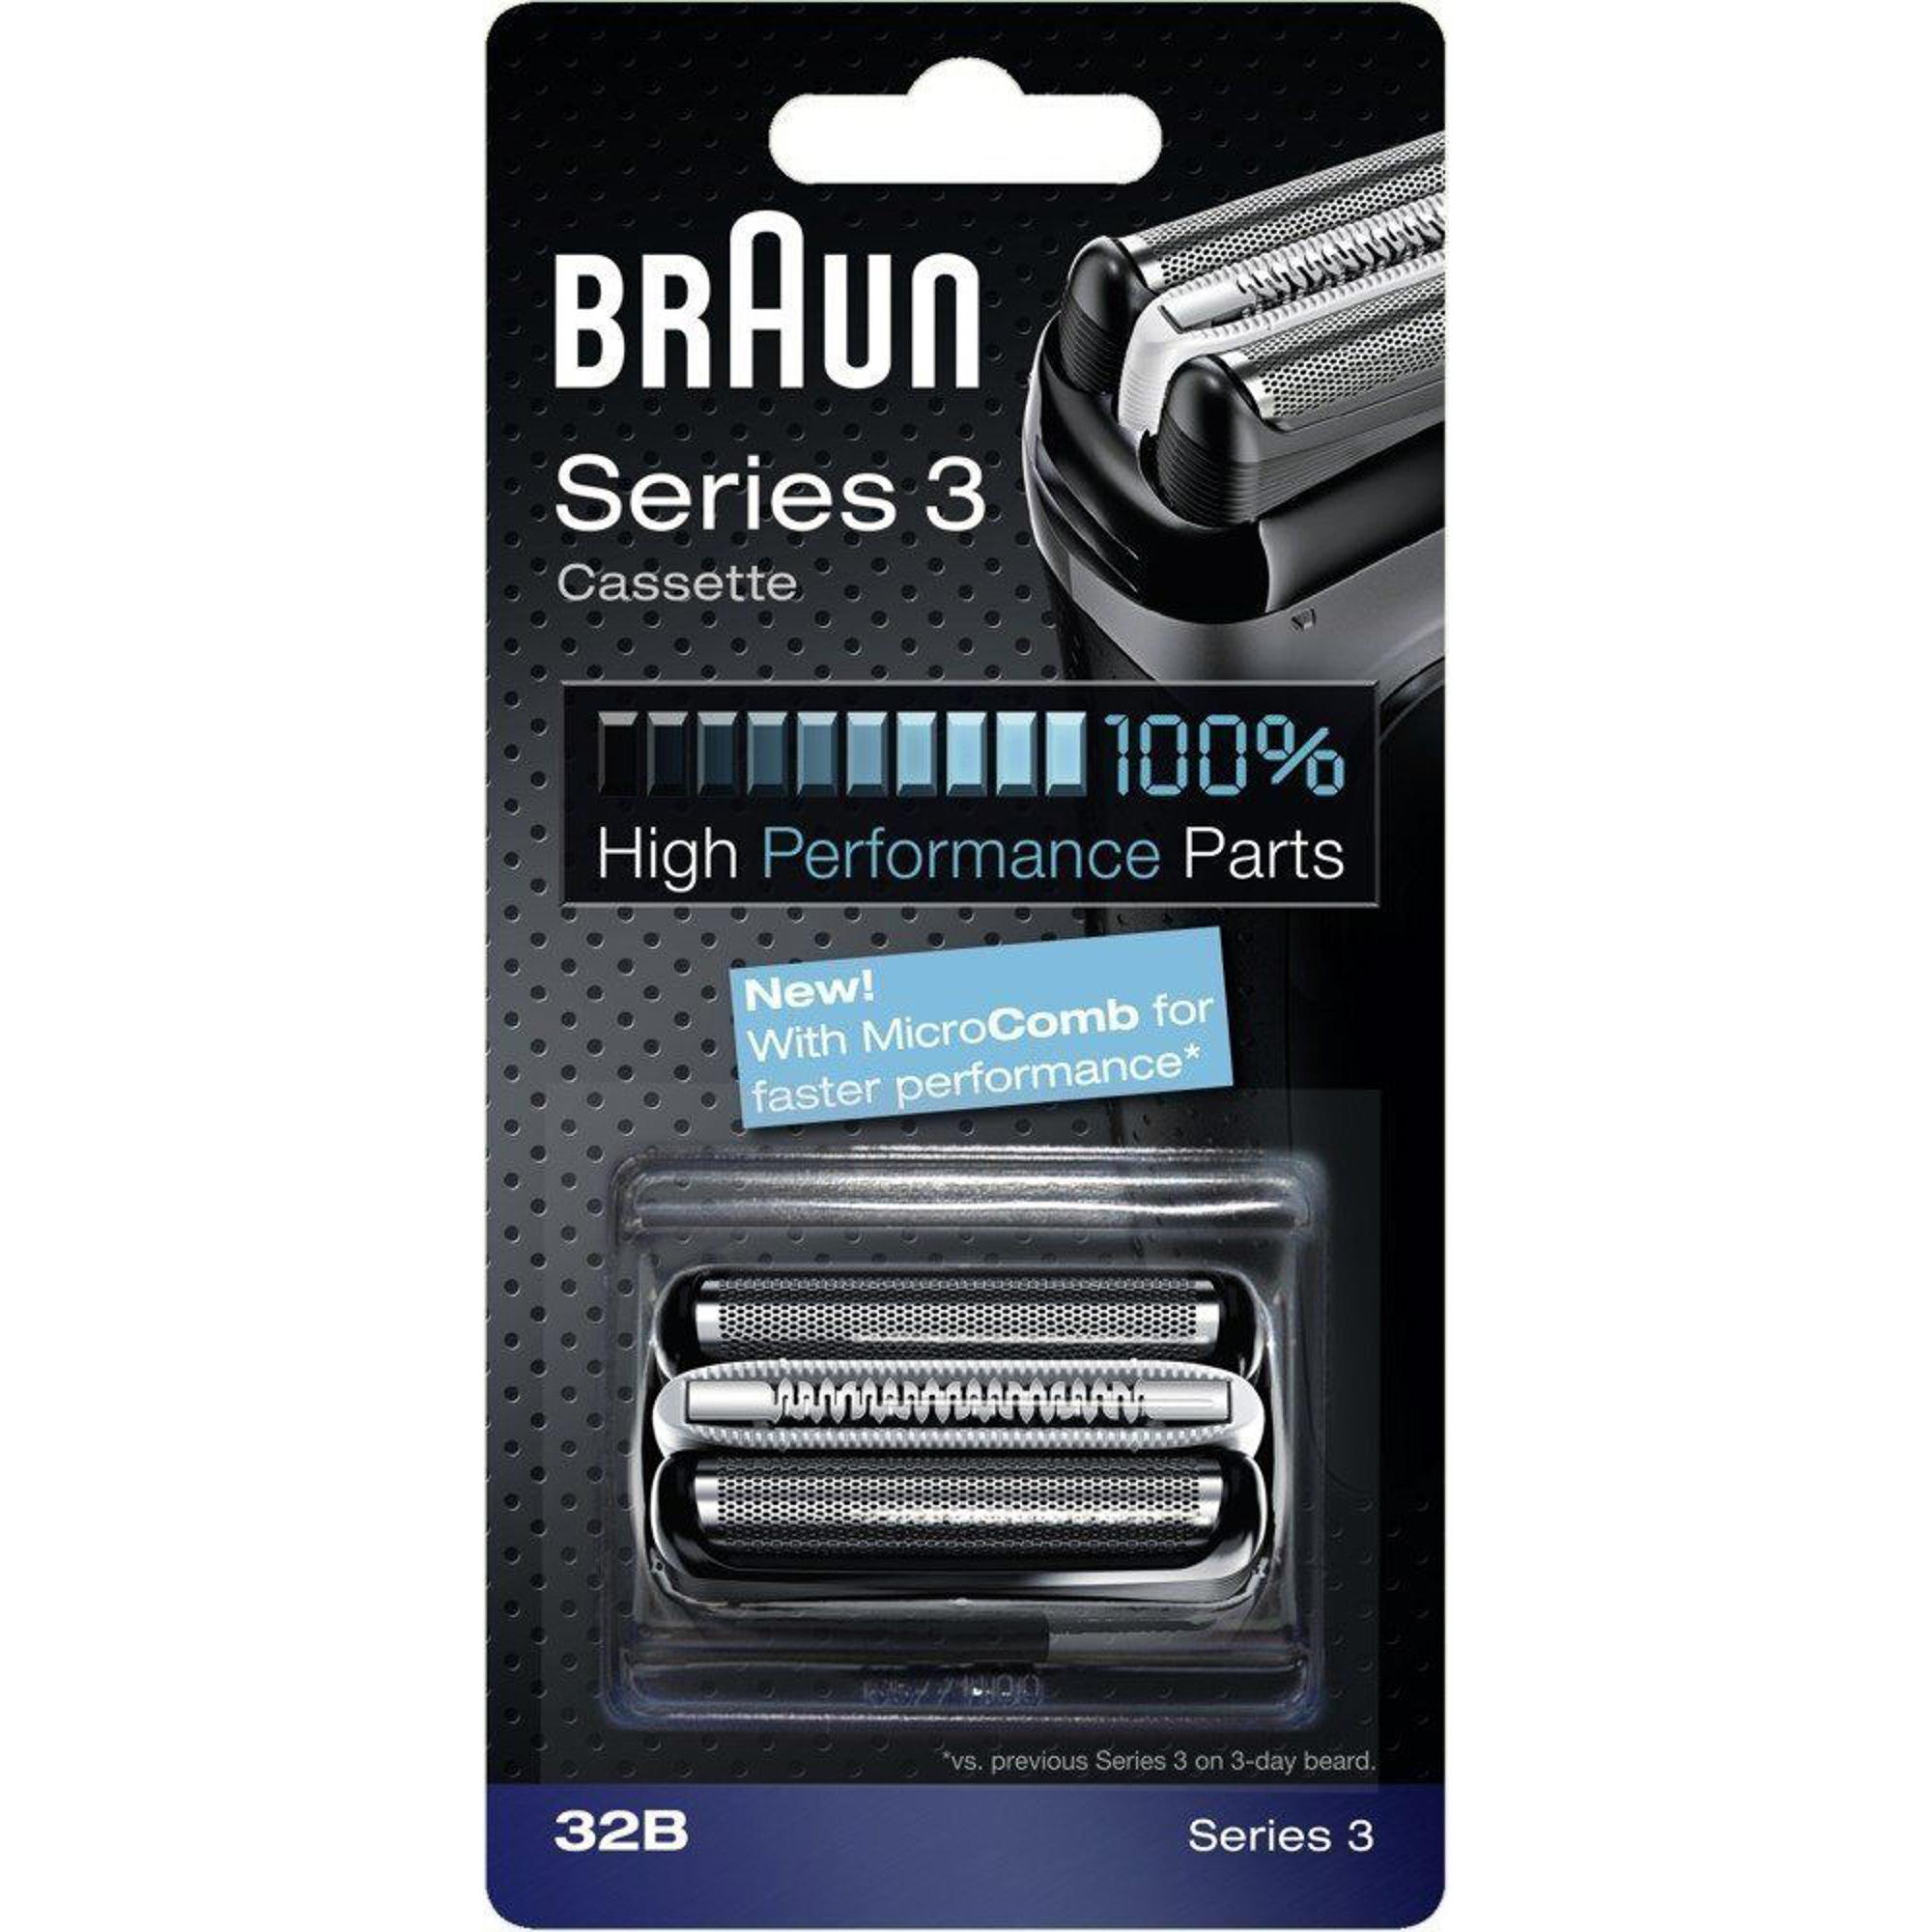 Сетка и режущий блок Braun Series 3 32B